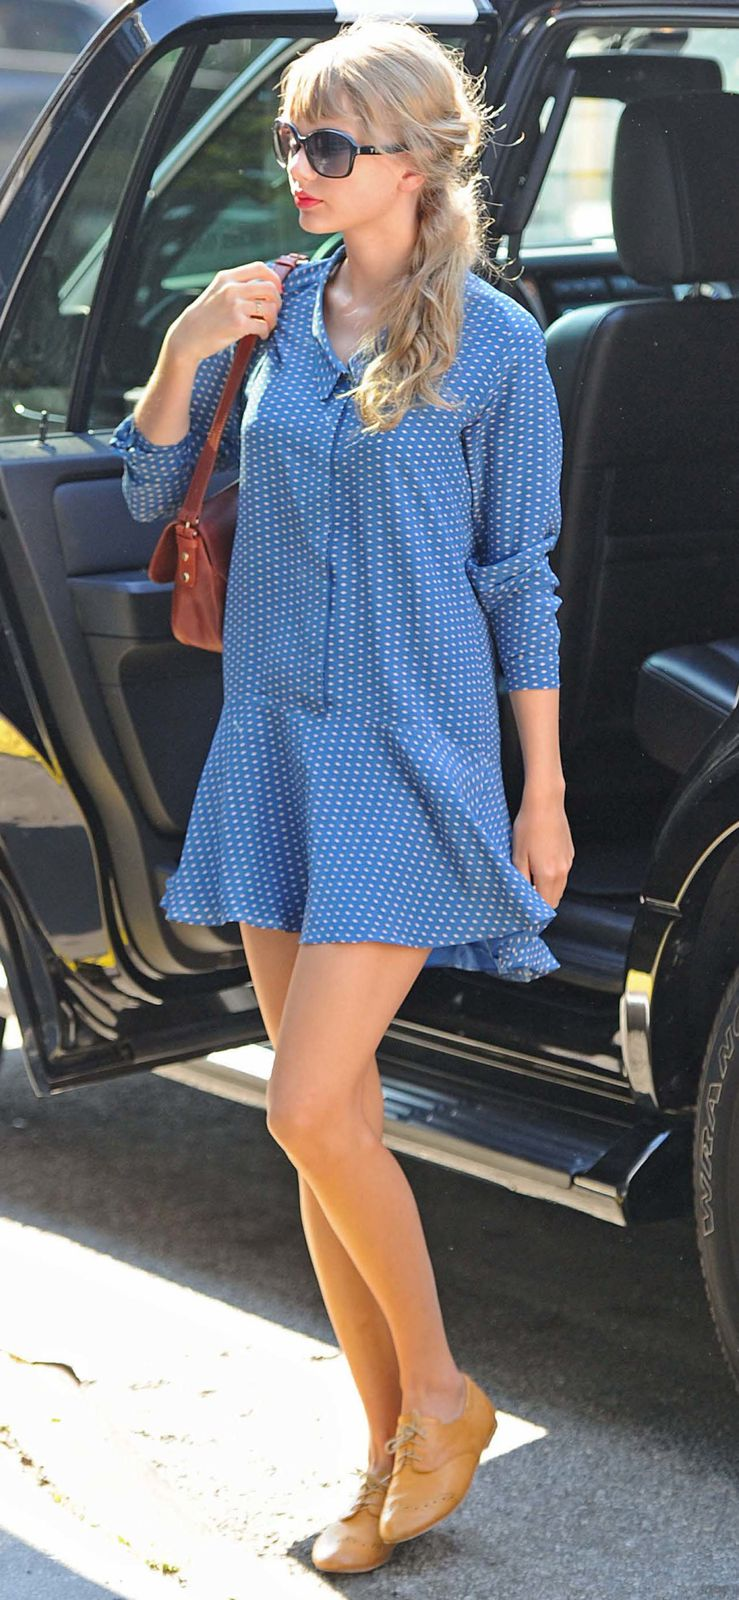 Taylor-swift-polka-blue-dress-New-york-city-2012-NYC-31-AG.jpg